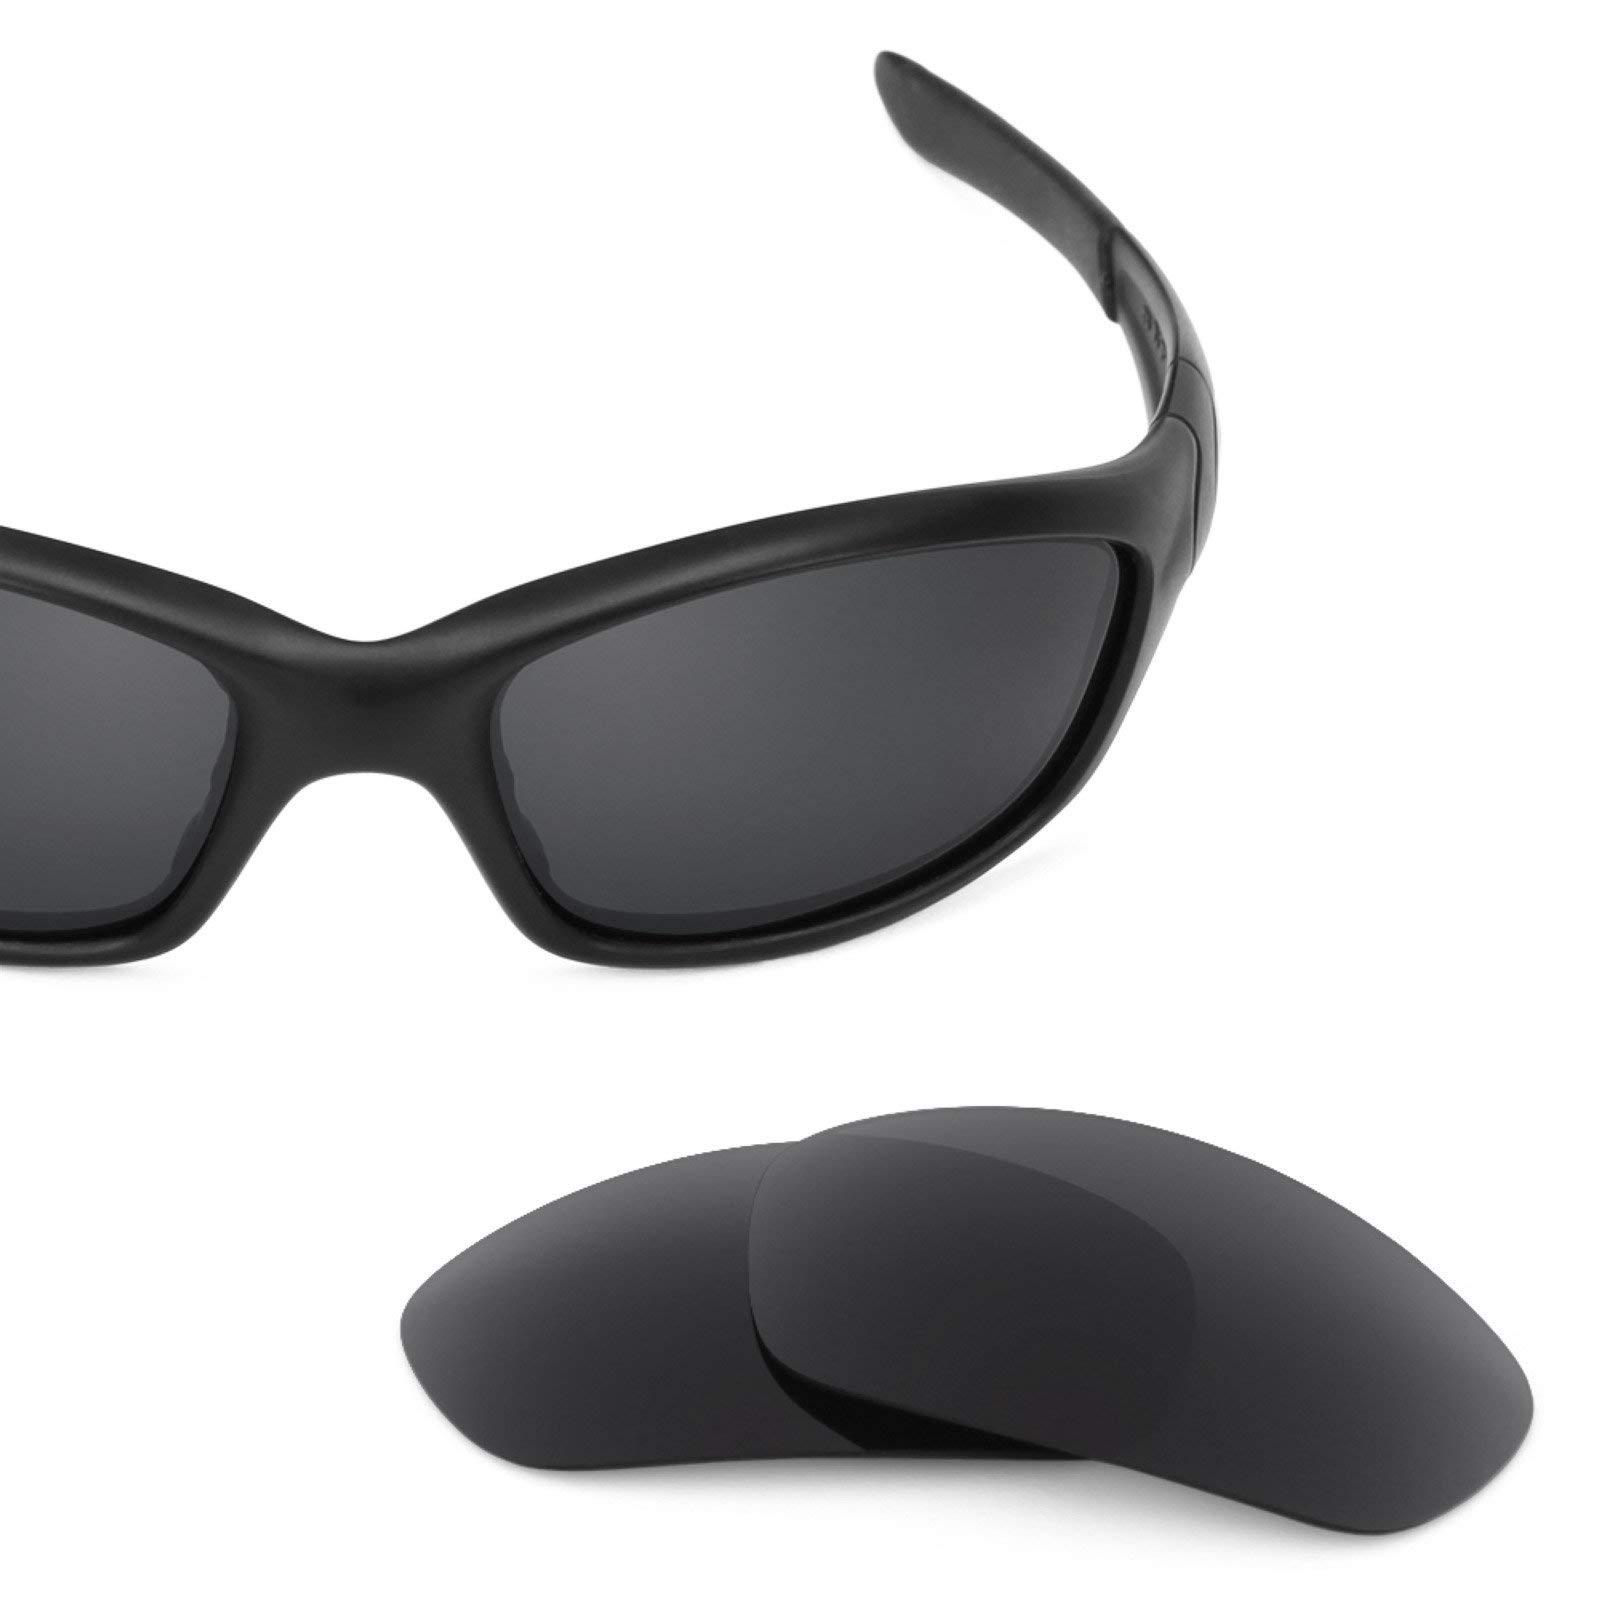 Revant Polarized Replacement Lenses for Oakley Straight Jacket (2007) Elite Stealth Black